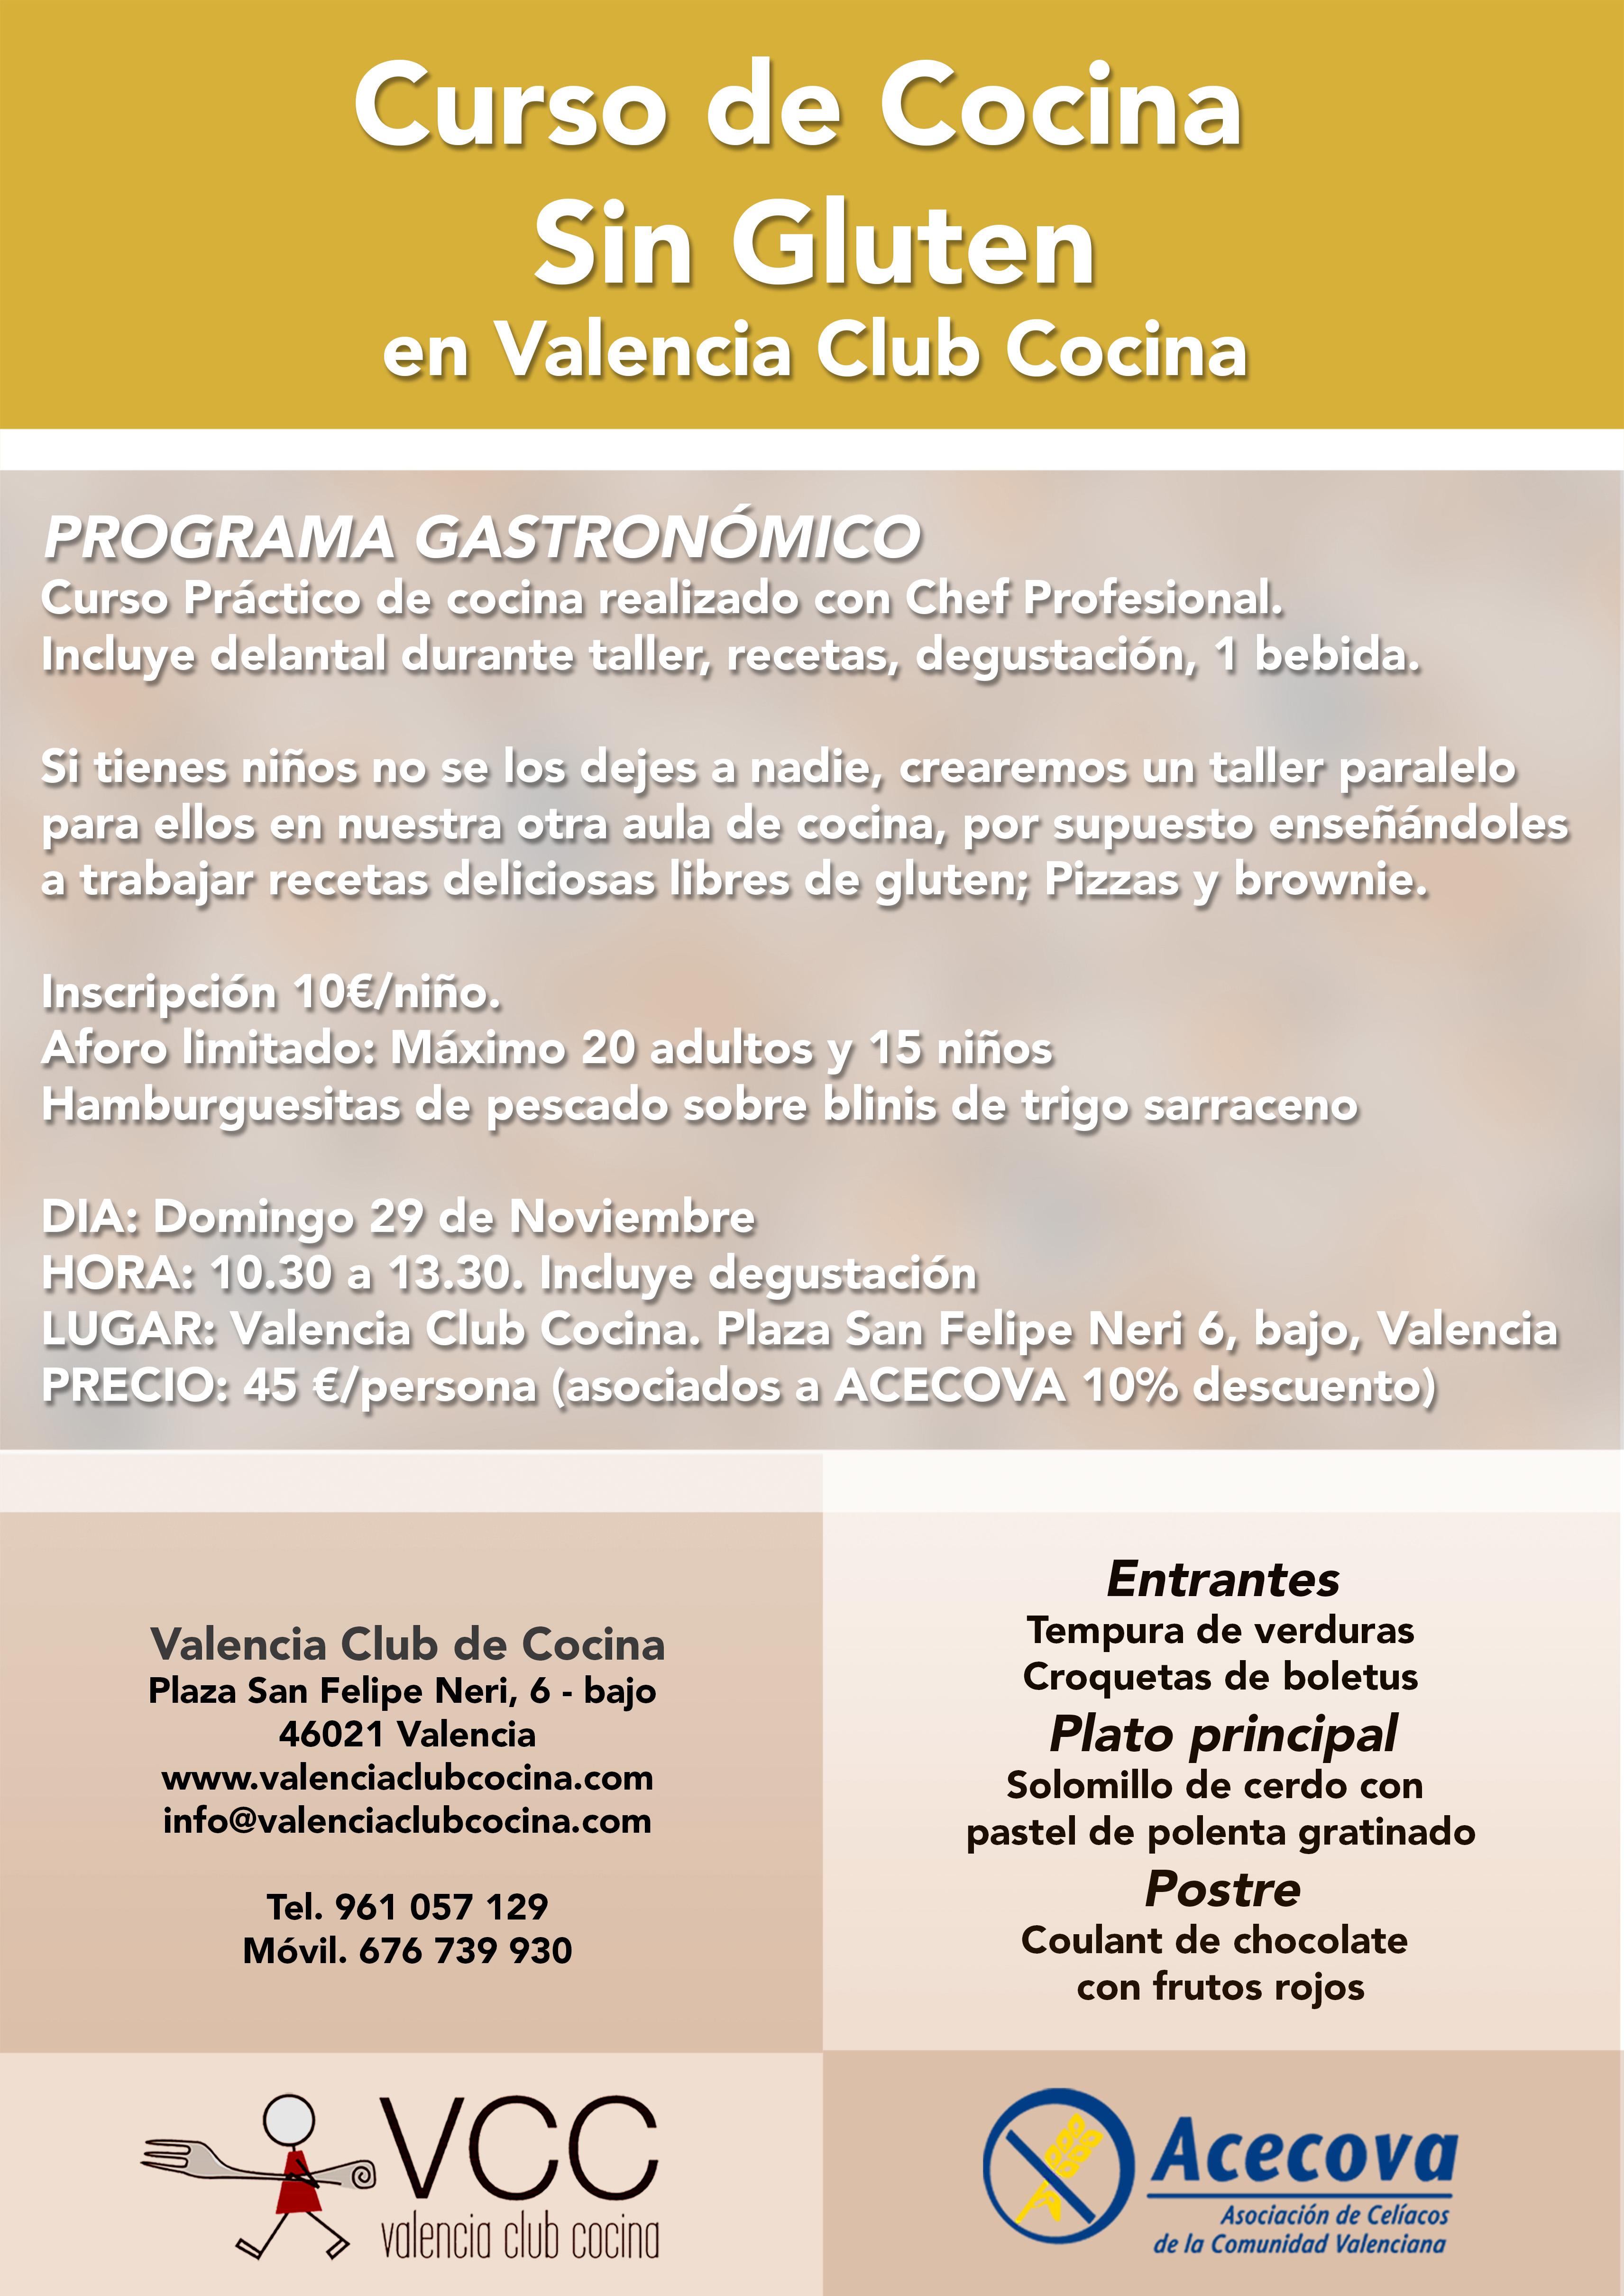 Valencia club cocina - Cursos de cocina en valencia gratis ...